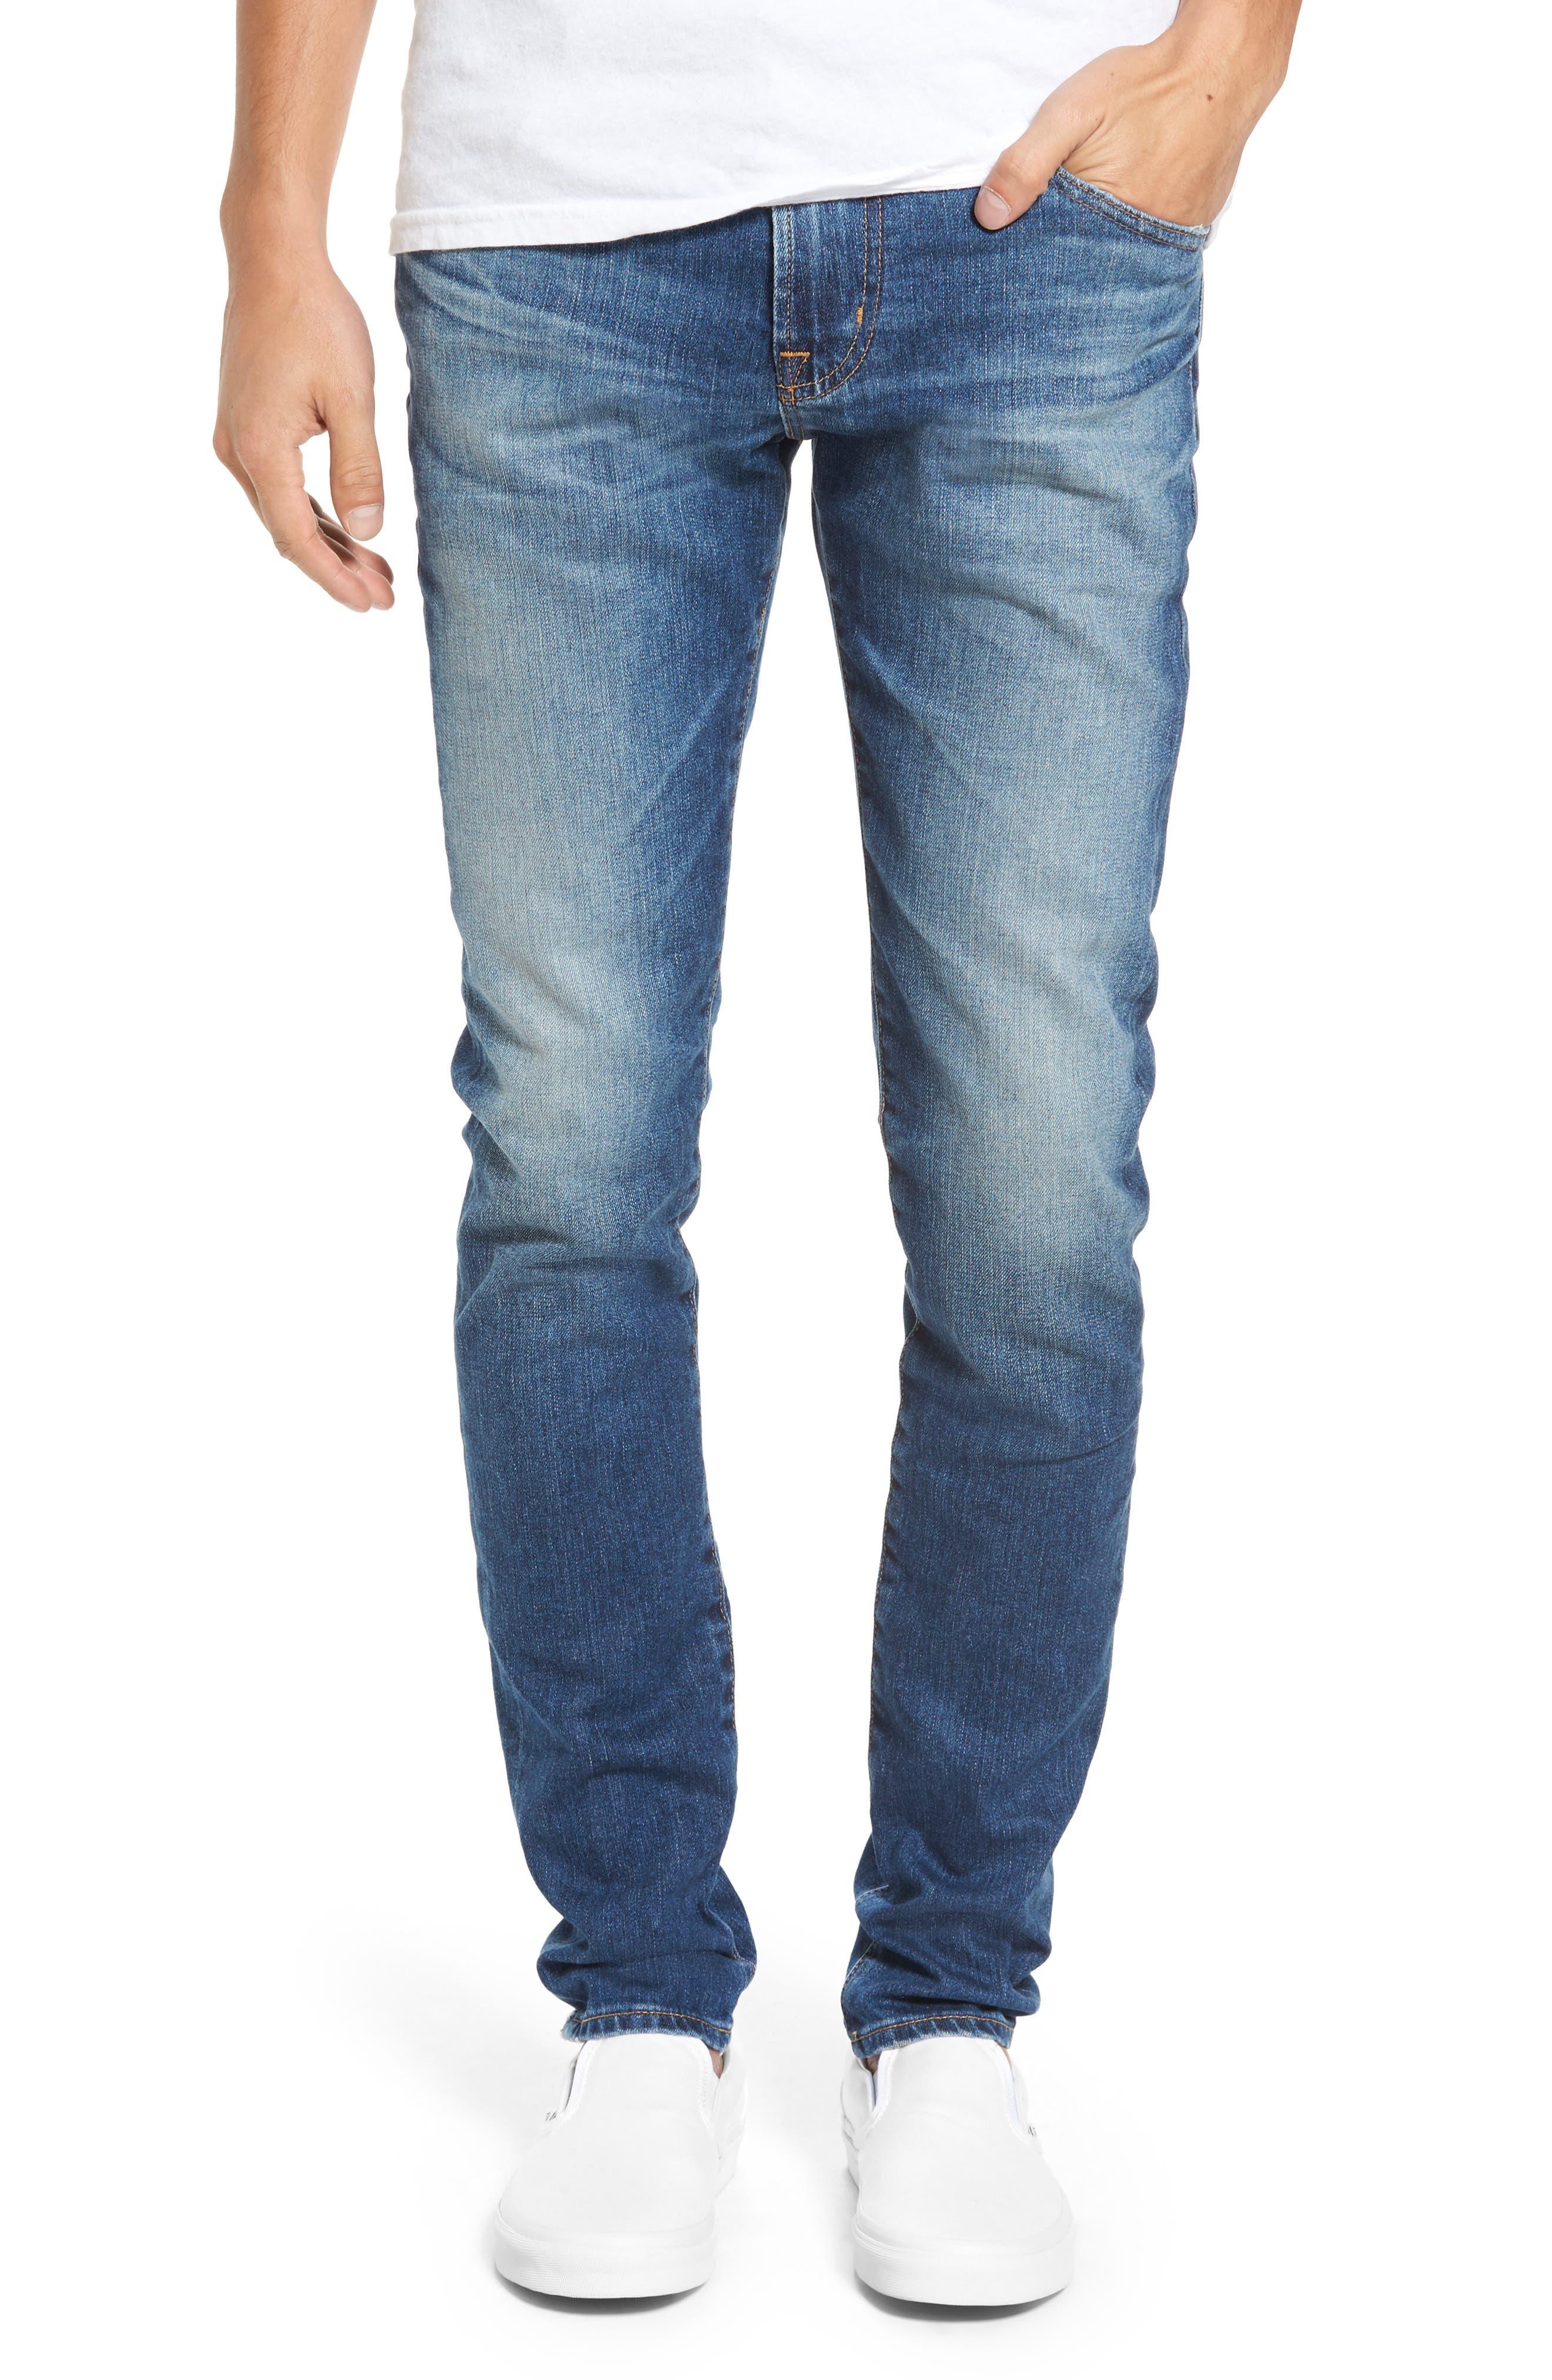 Jeans Stockton Skinny Fit Jeans,                             Main thumbnail 1, color,                             427